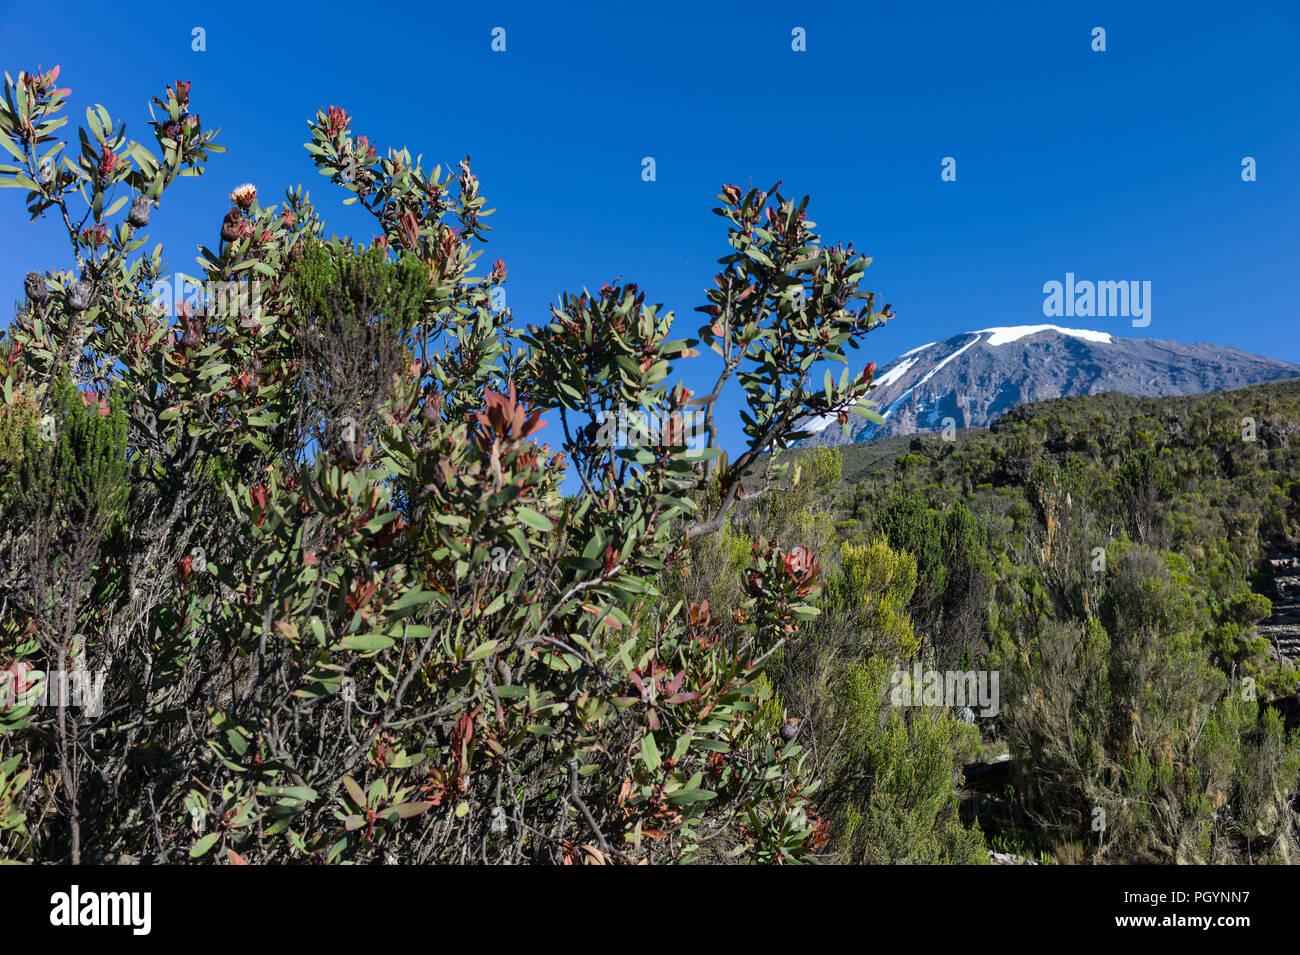 Kilimanjaro Protea, Protea kilimandscharica, in front of Kibo Peak, Mount Kilimanjaro, Kilimanjaro Region, Tanzania. - Stock Image